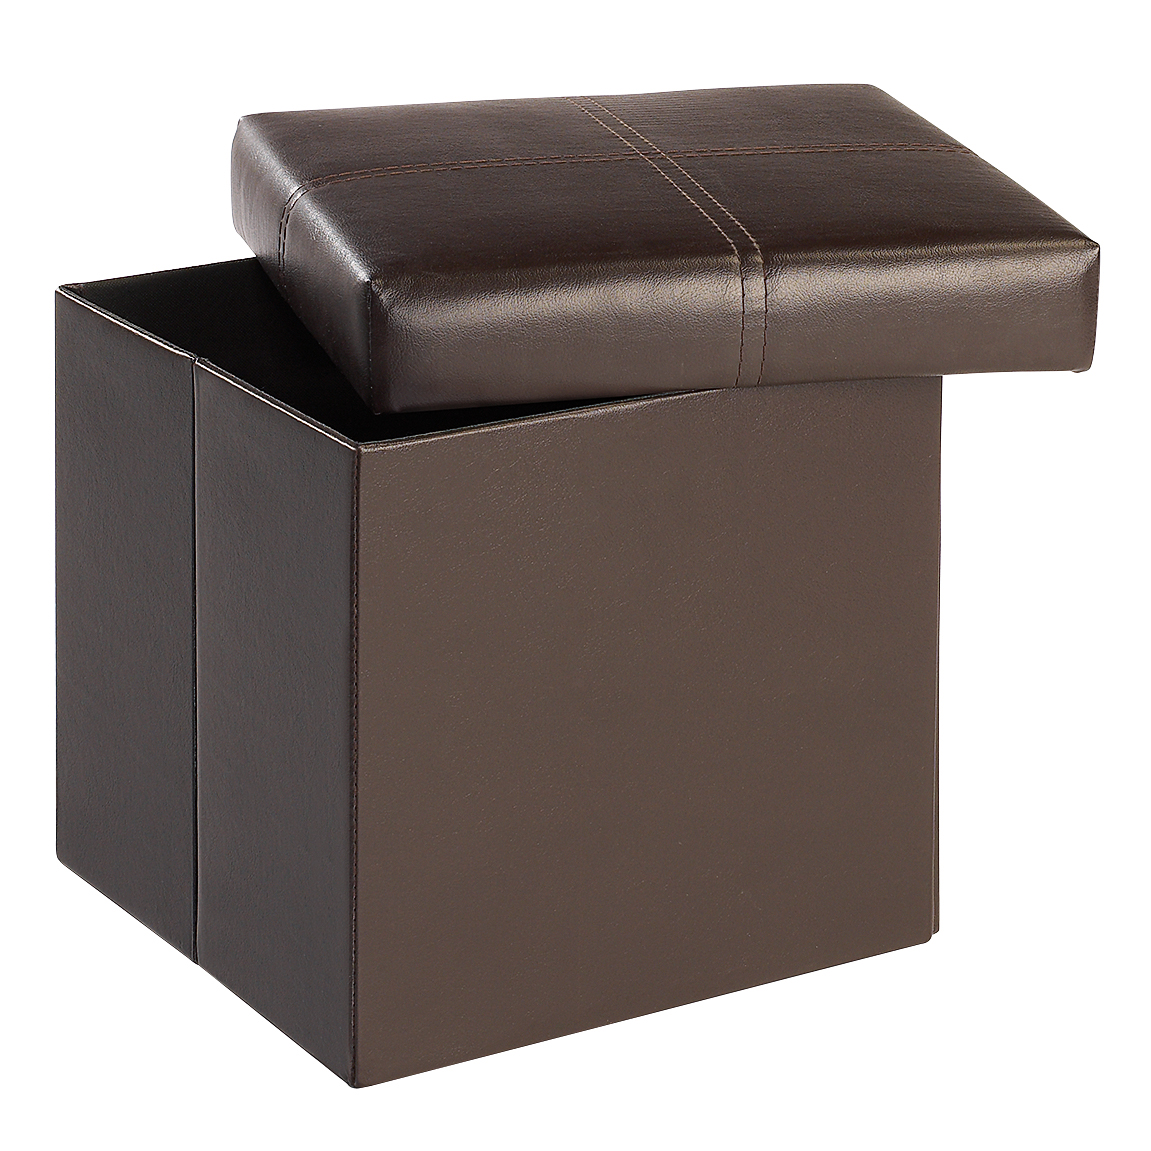 Medit Storage ottoman Small Brown